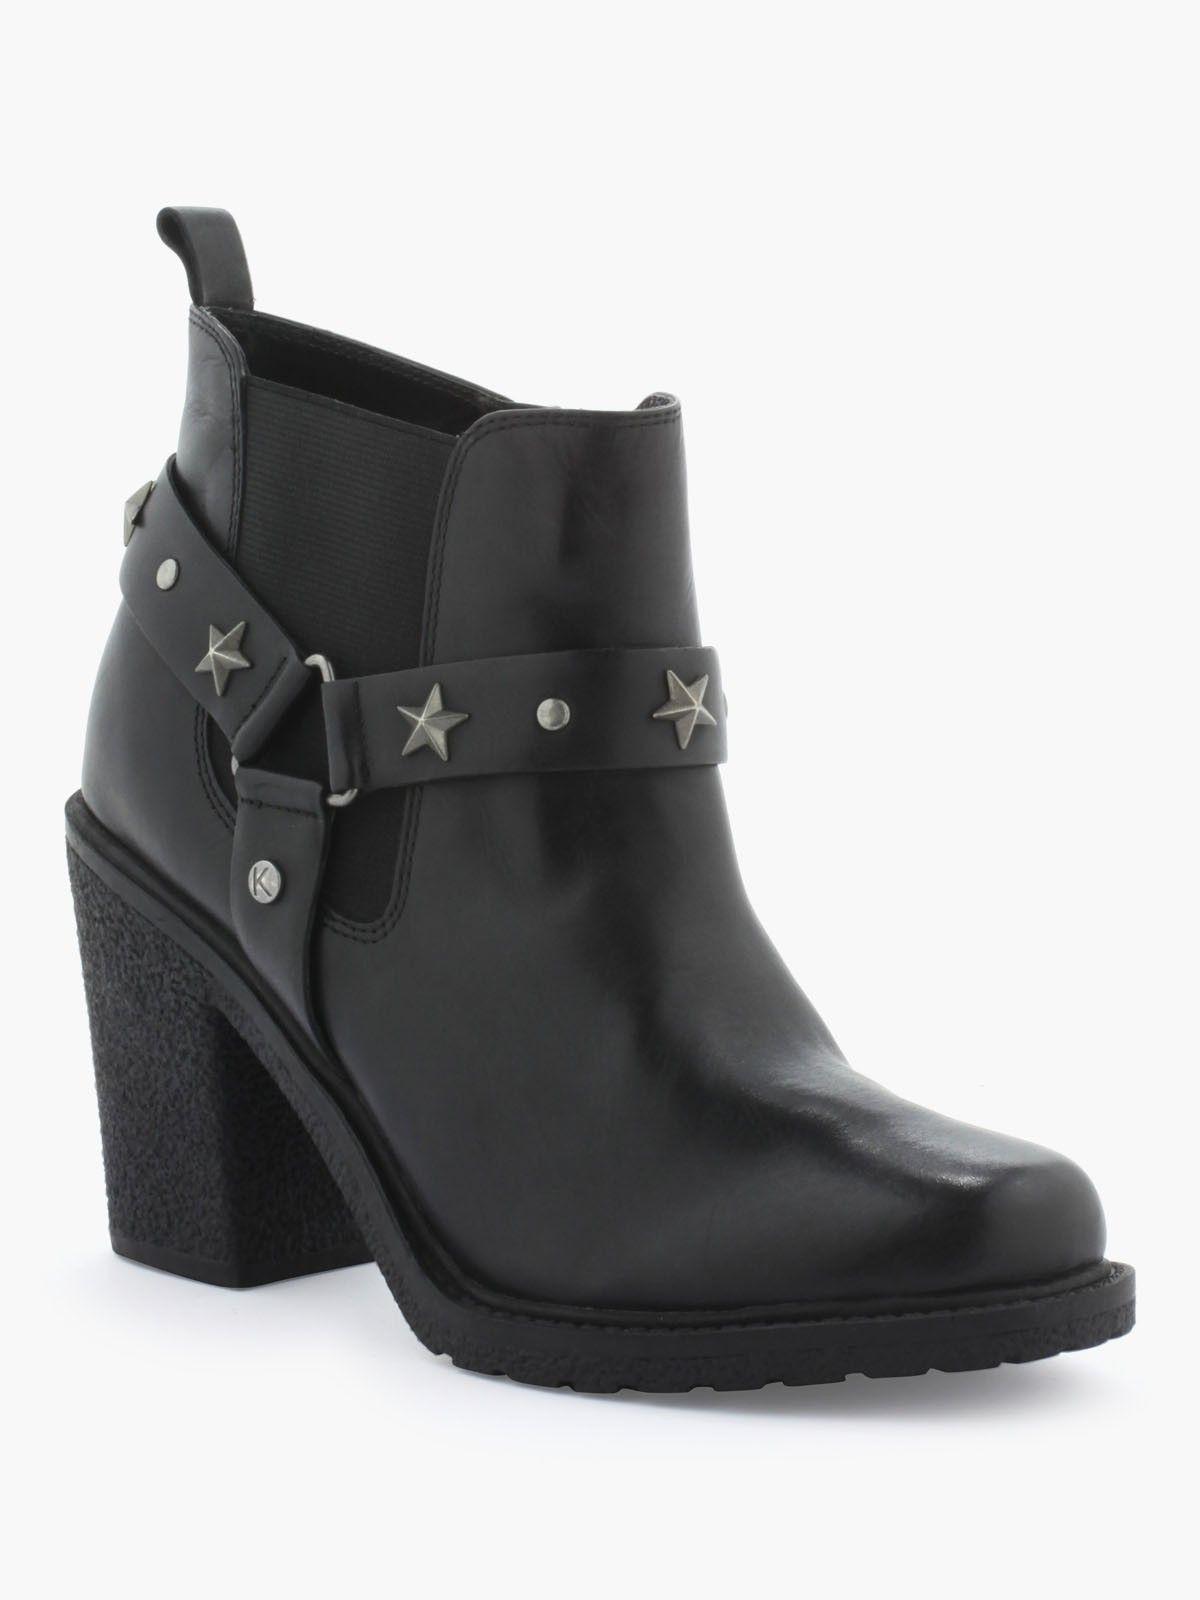 Boots kookaiShoesShoesBoots by K et Fashion 35A4LqjScR